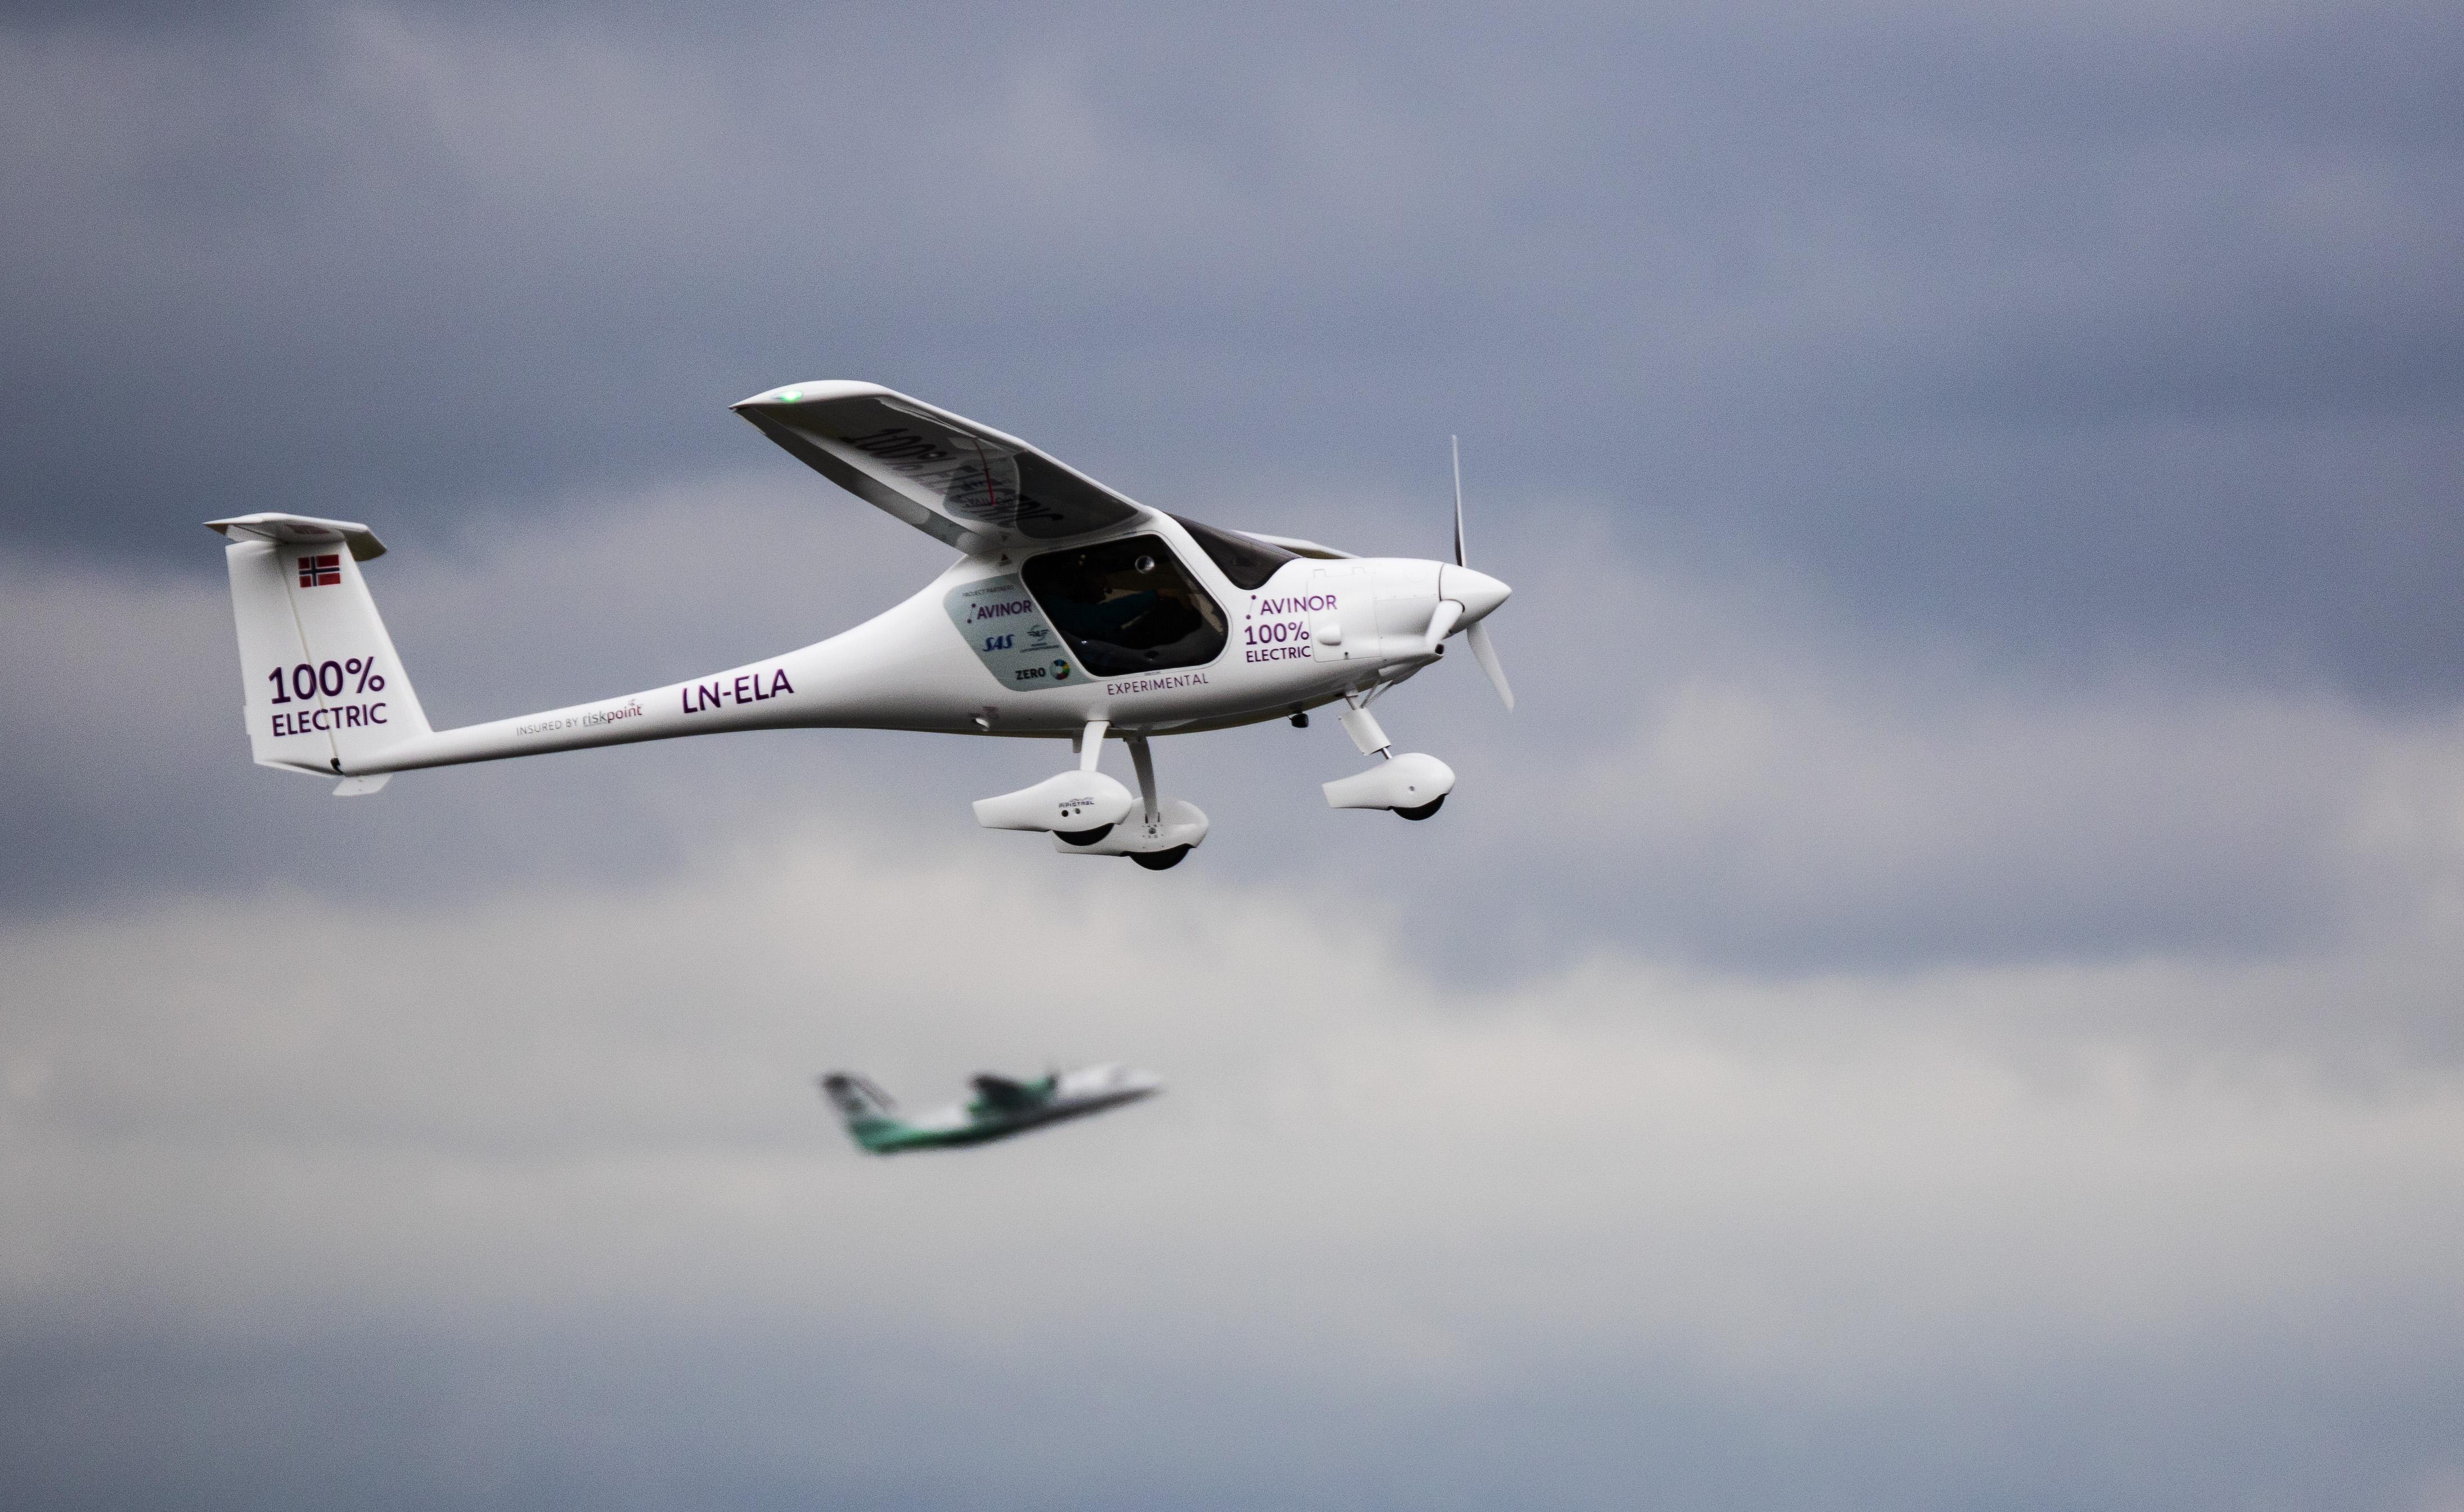 Første elektriske fly i luften fra Oslo Lufthavn. (Foto: Avinor)